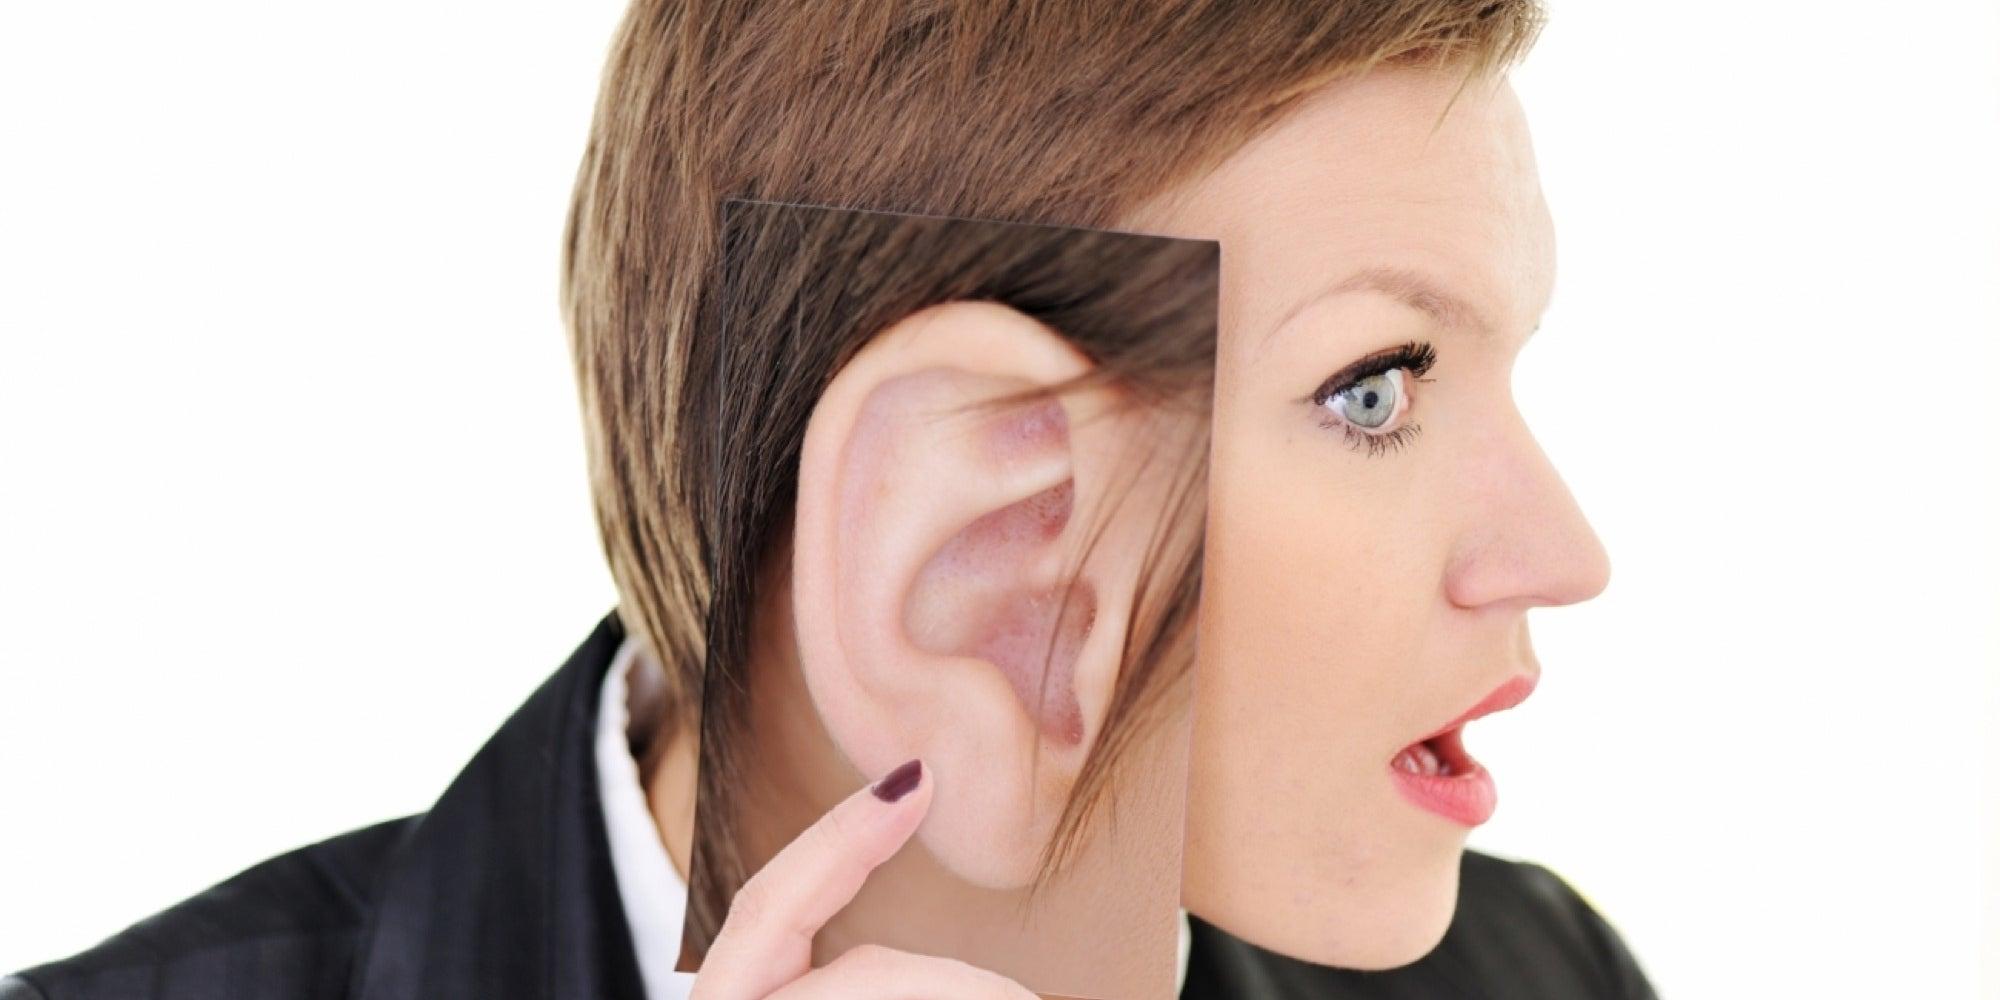 Listen to social conversations